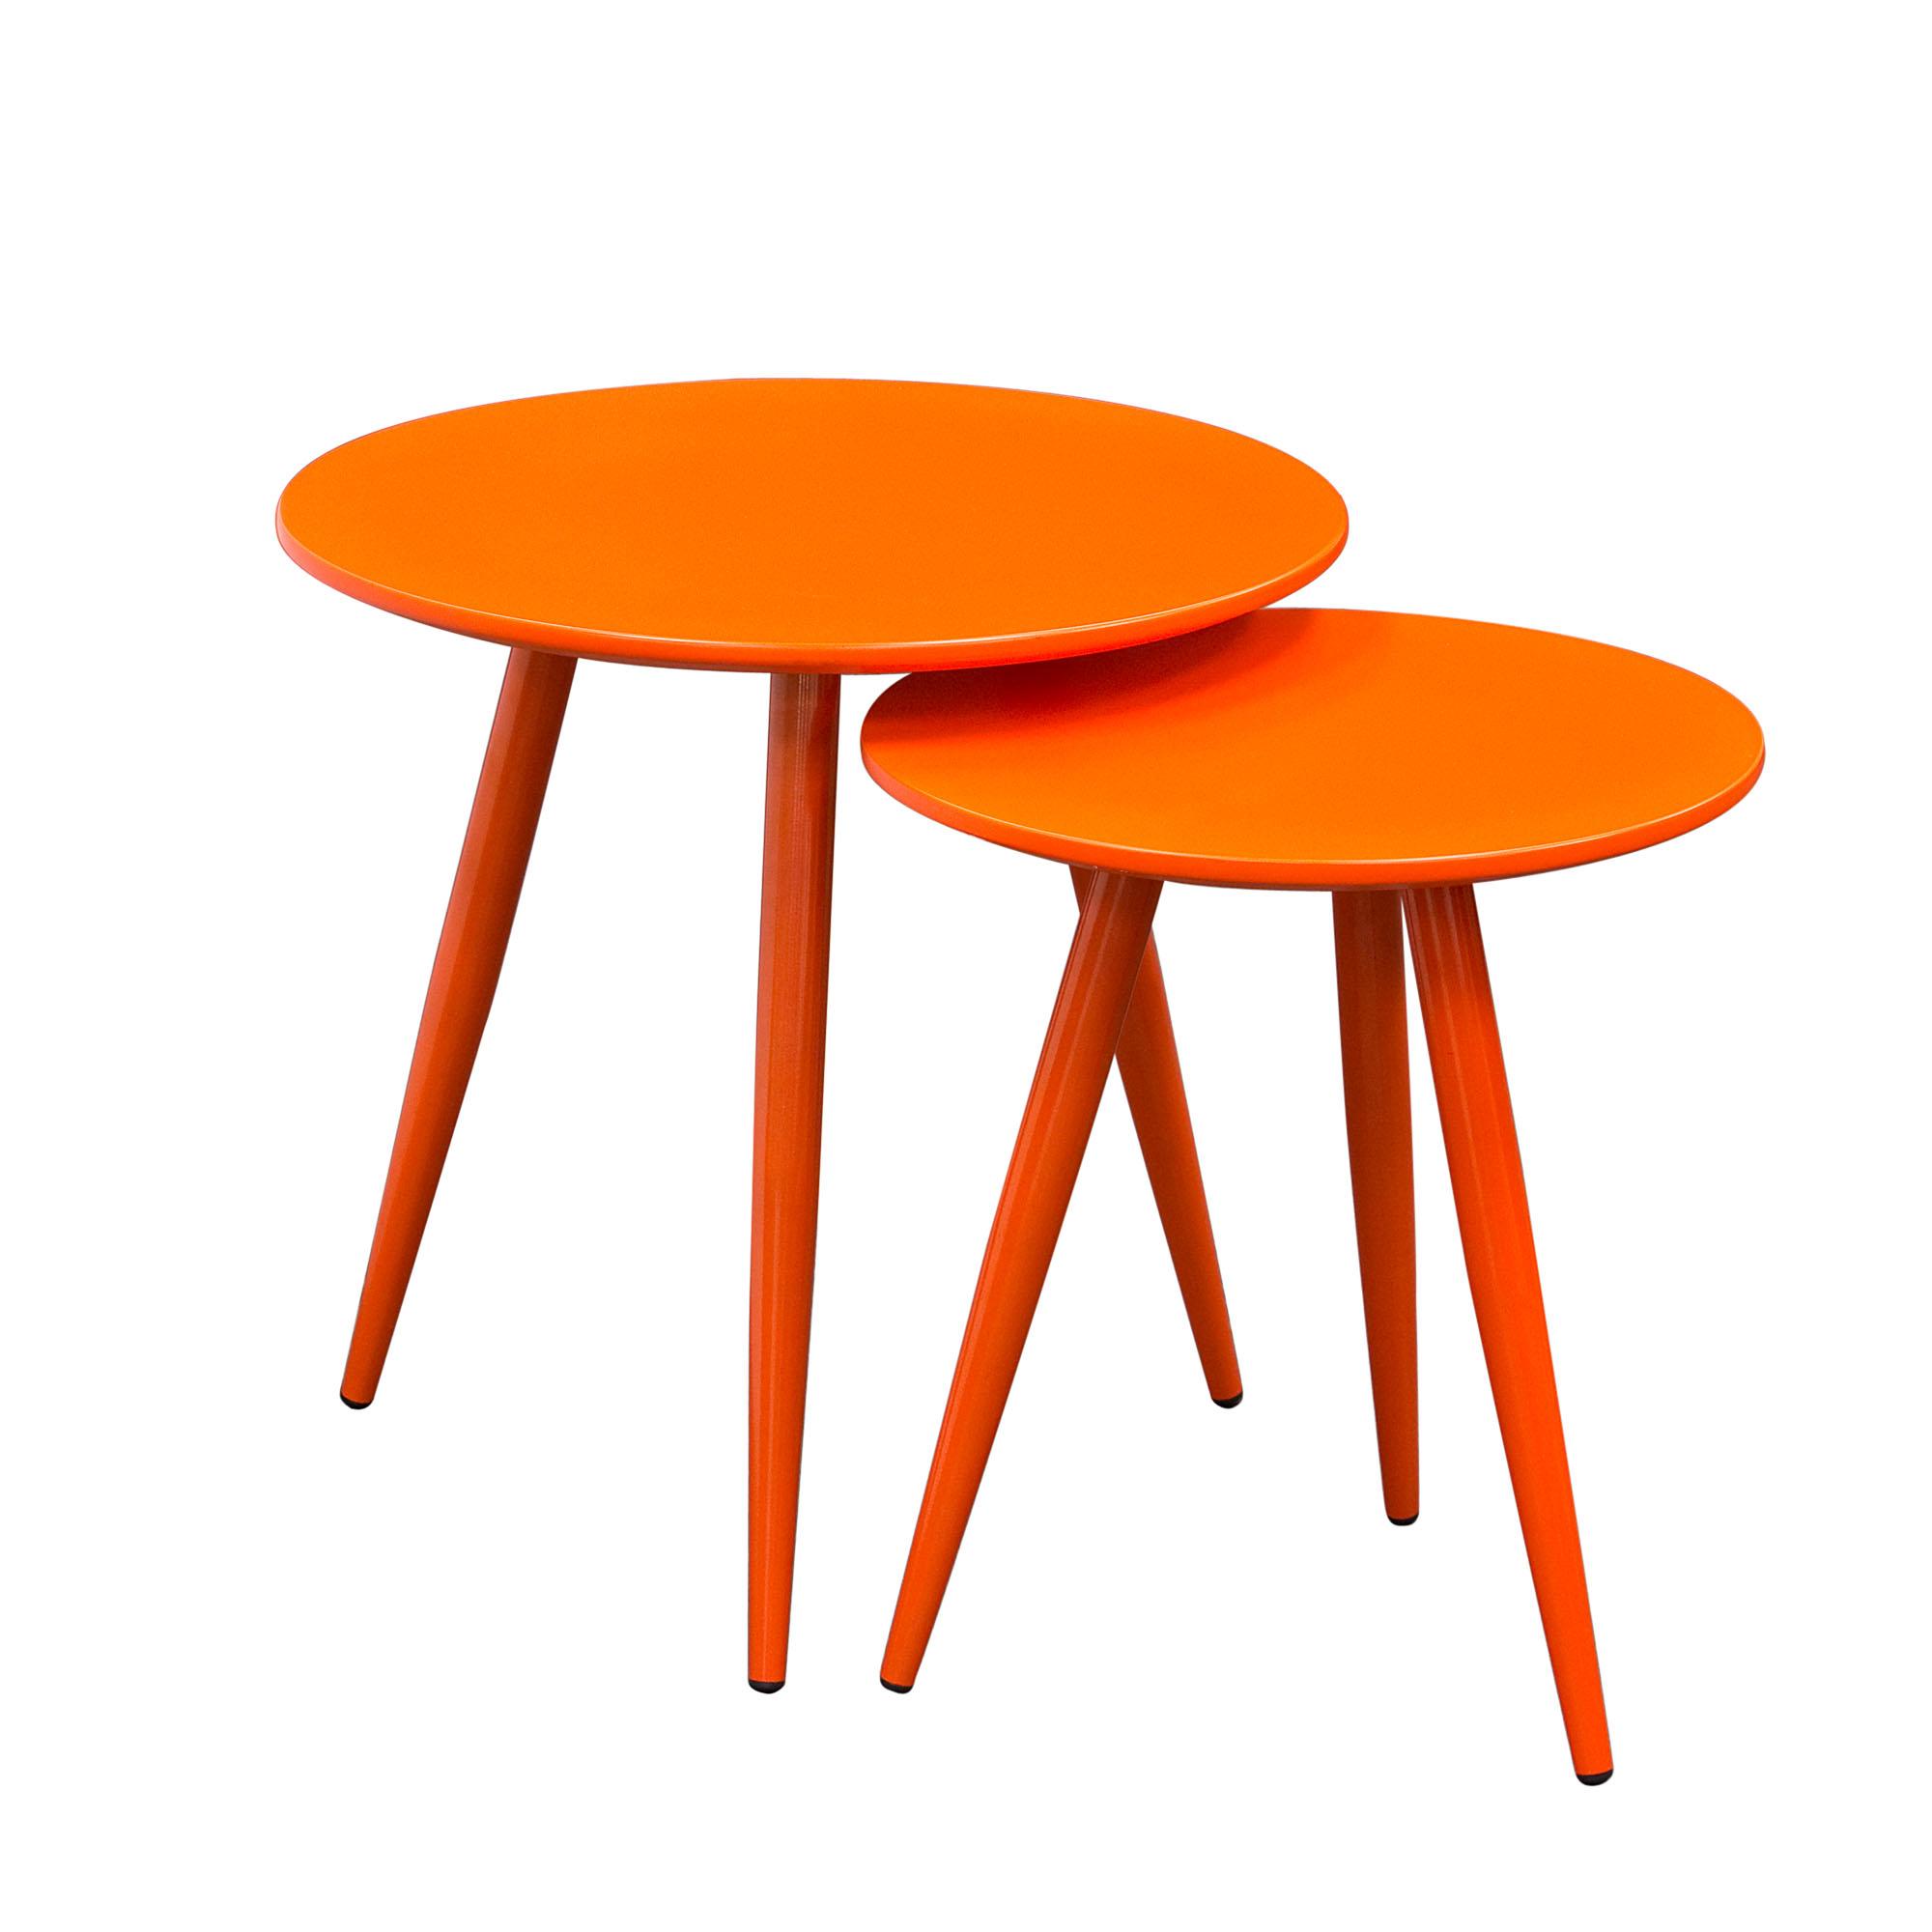 Diamond Sofa Duo 2PC Nesting Tables - Item Number: DUOETOR